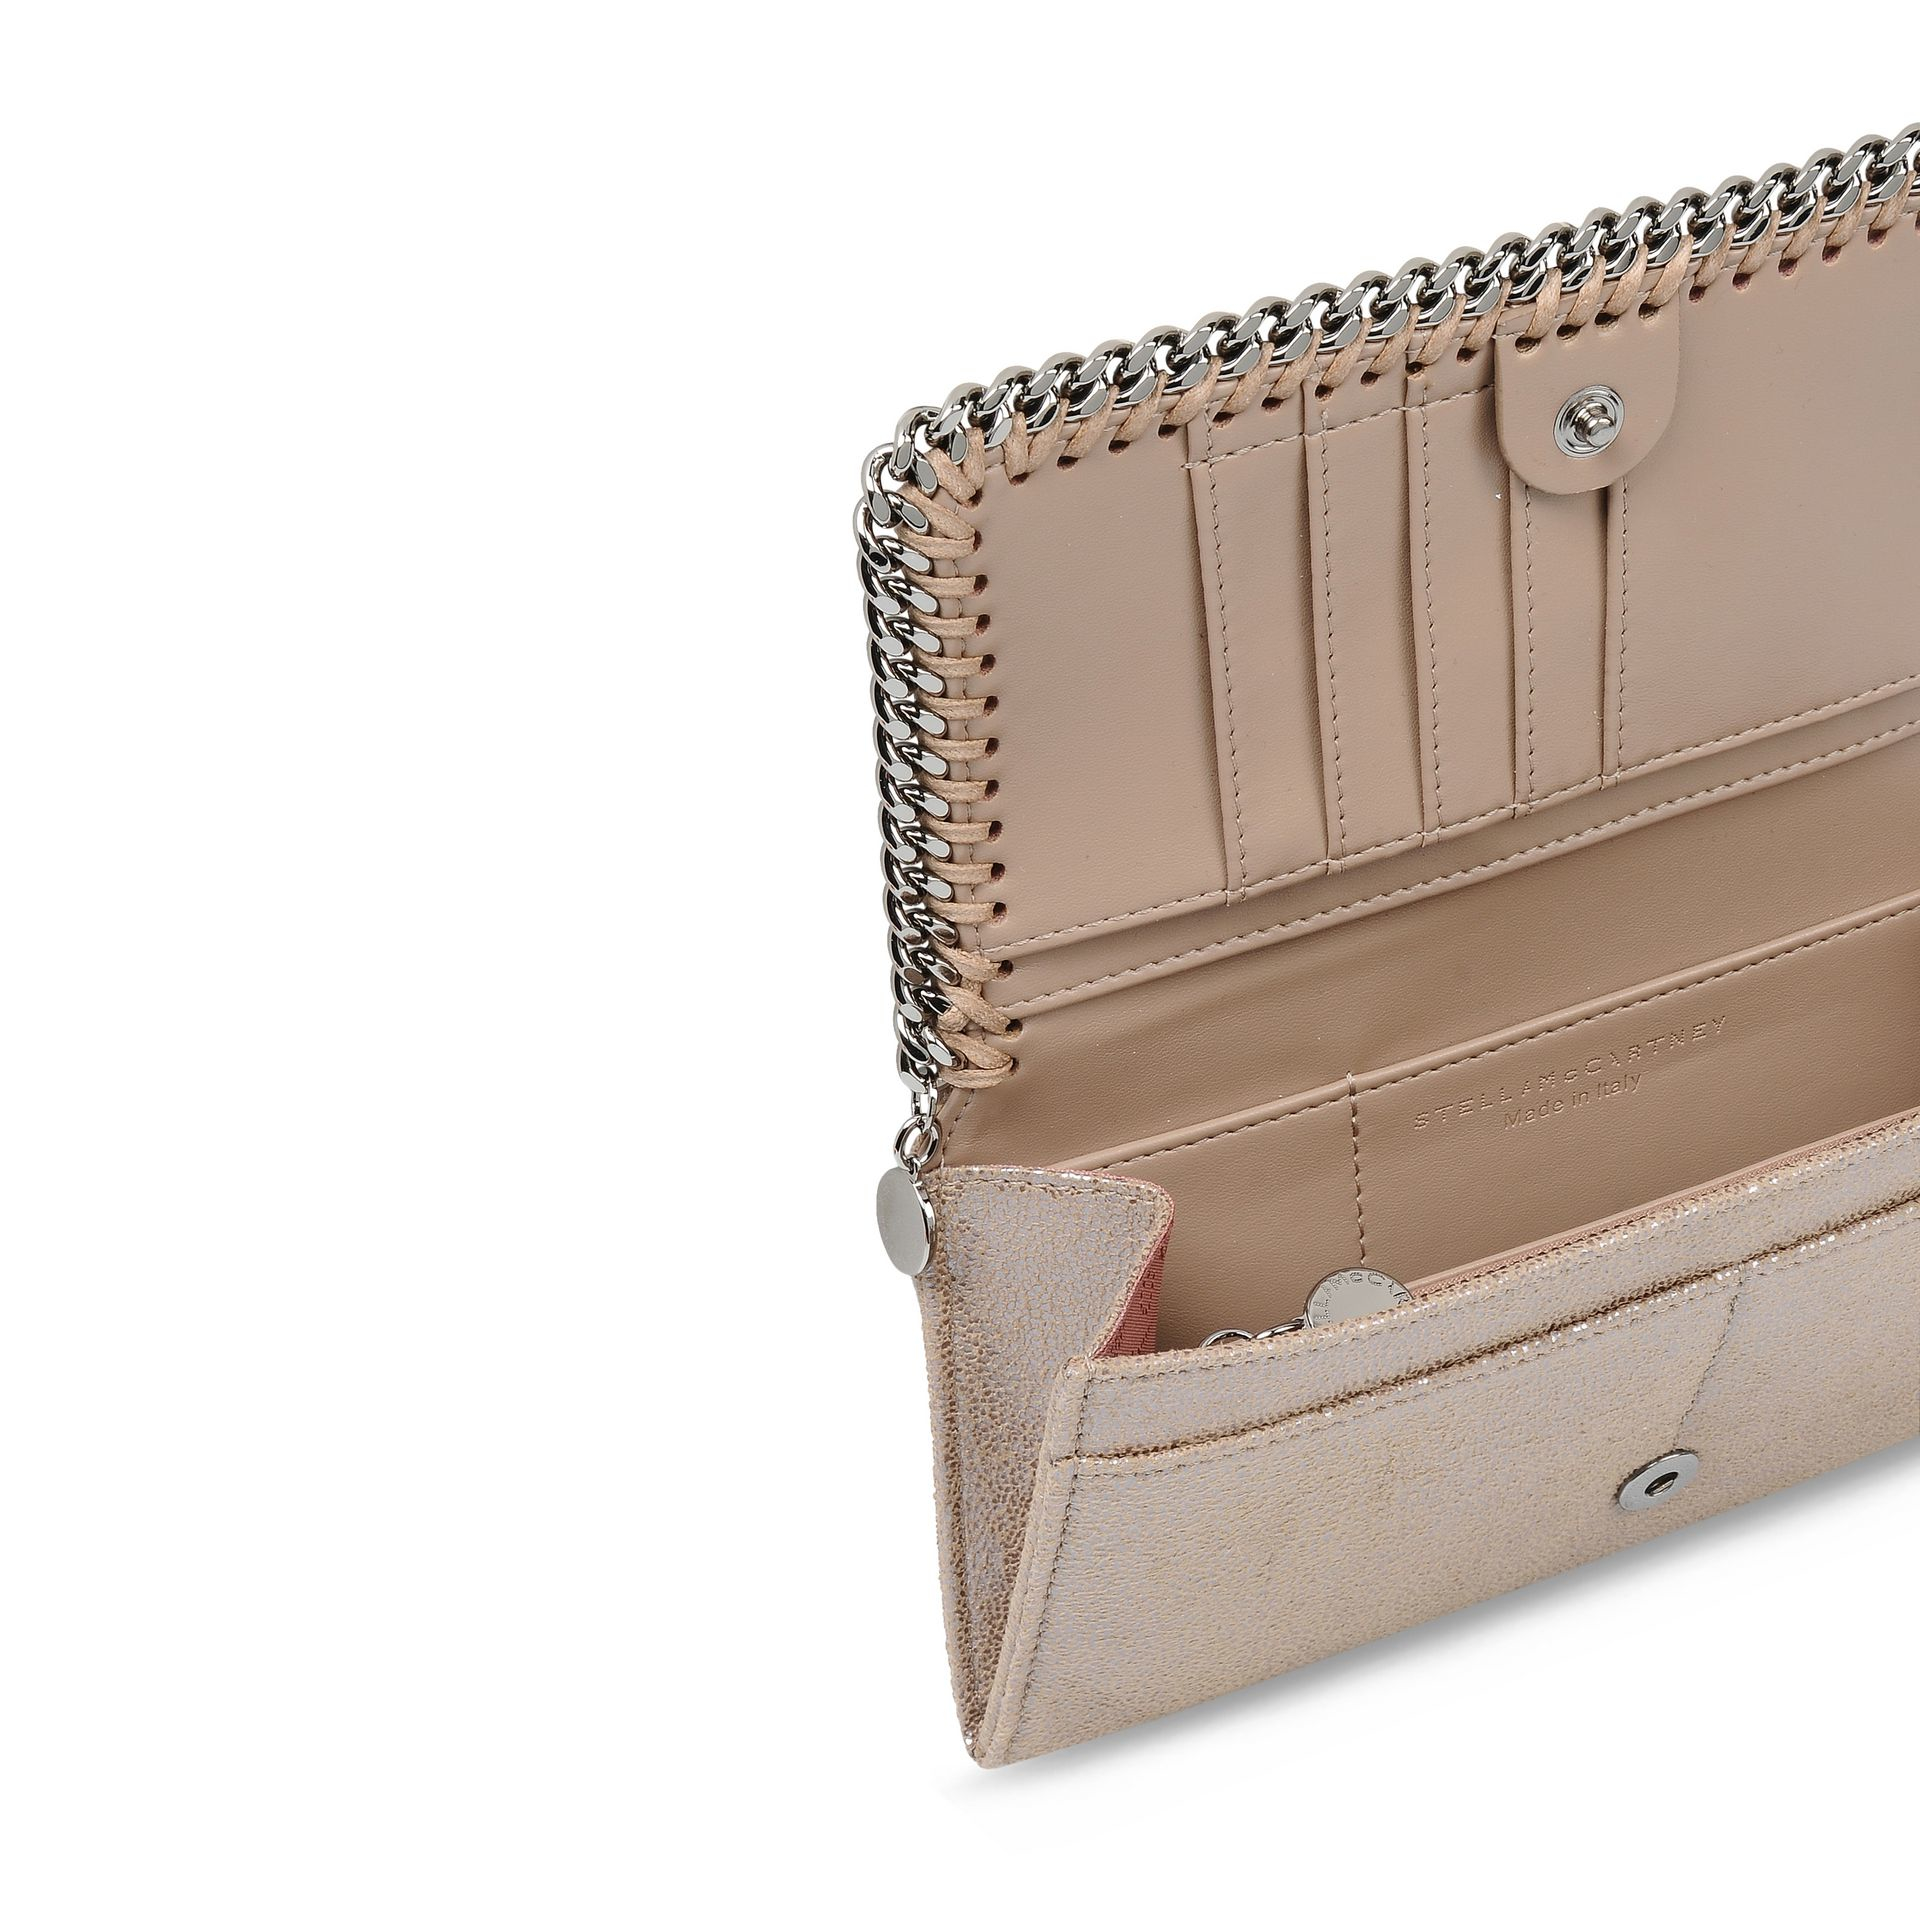 Falabella continental flap wallet Stella McCartney wI1tx